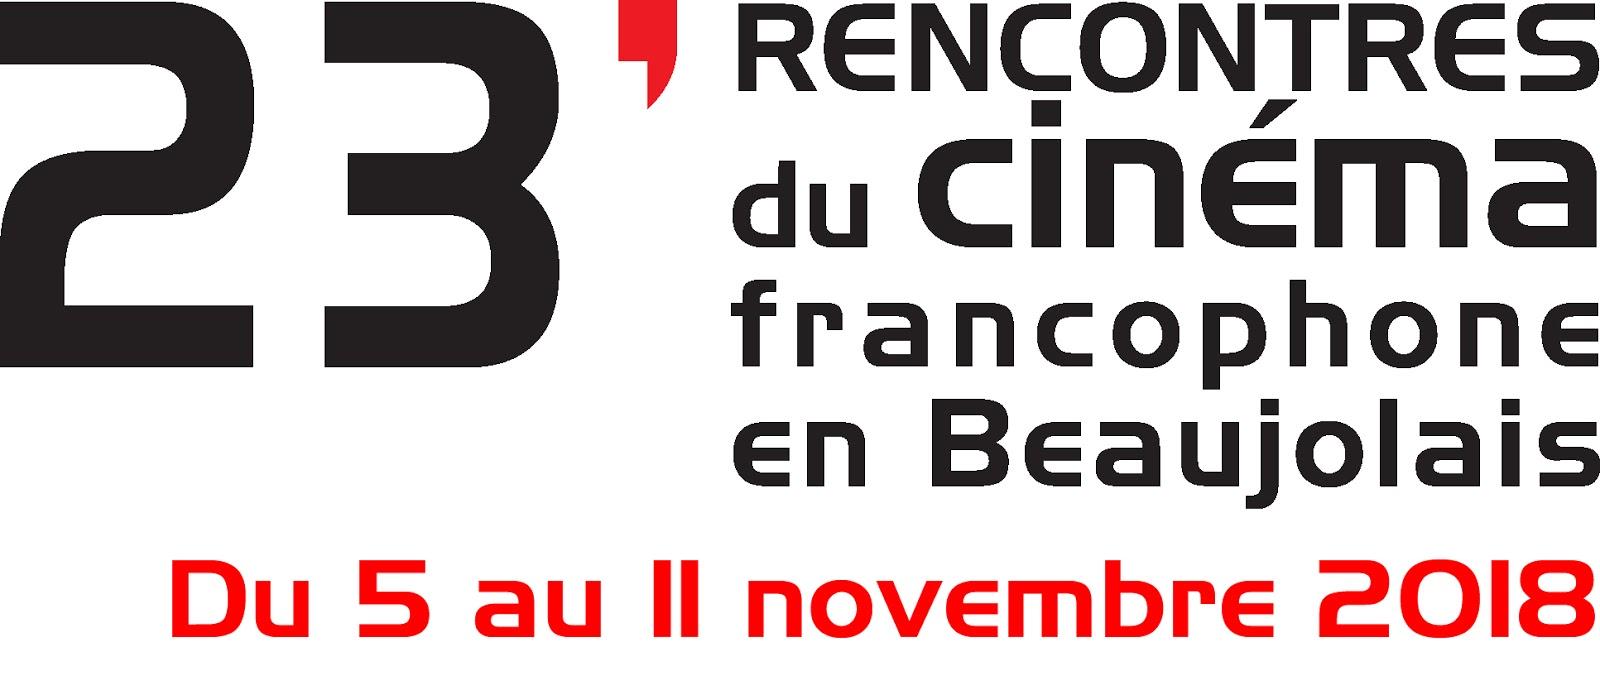 Rencontre s francophones